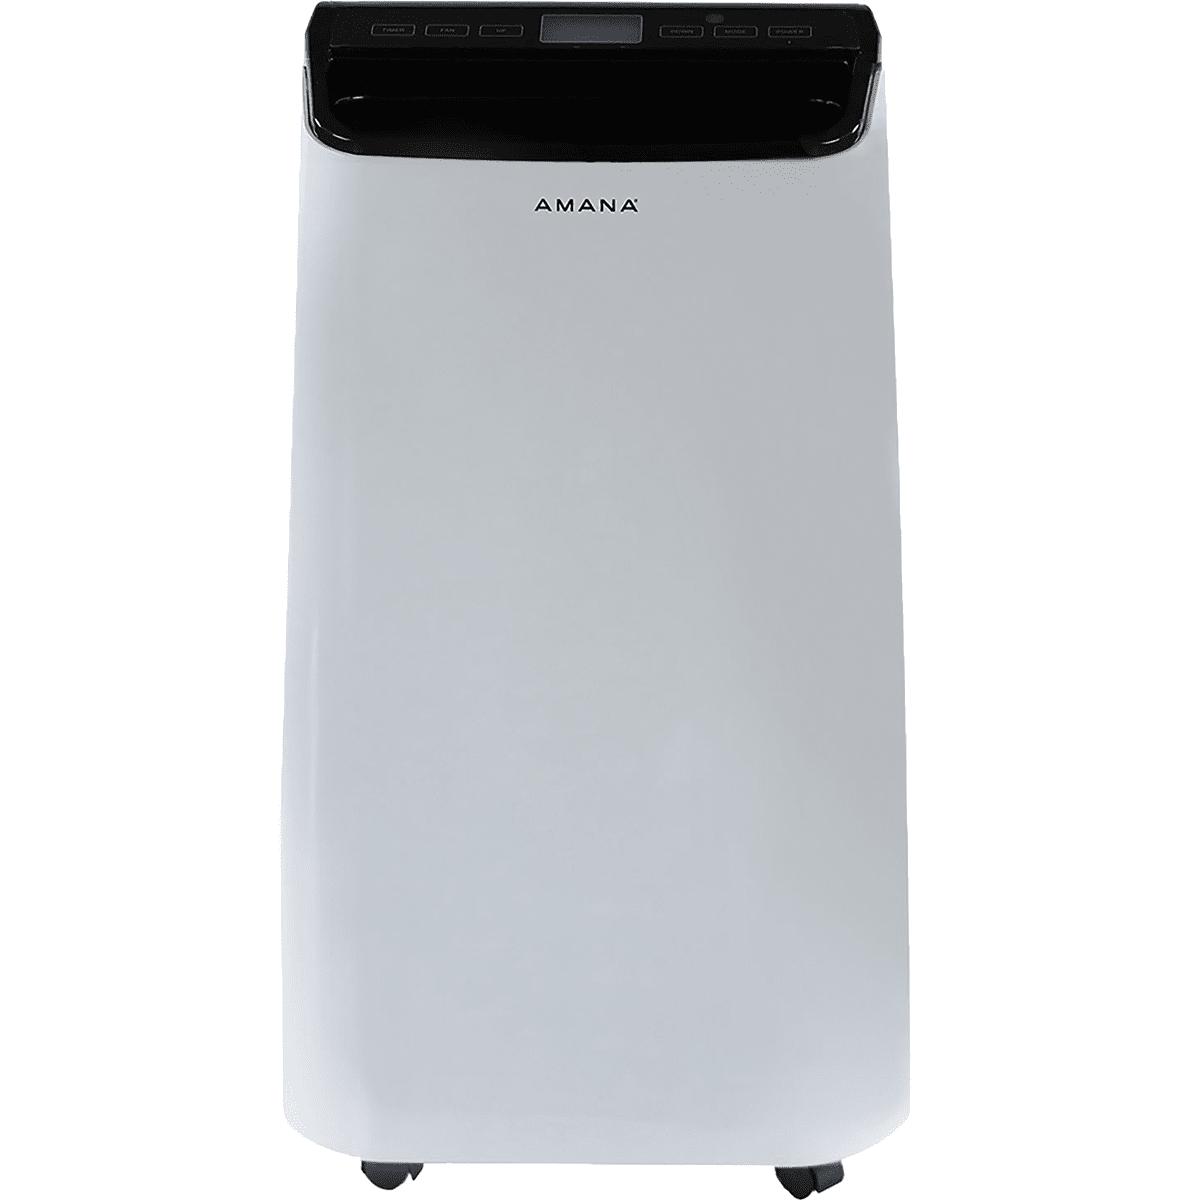 Amana 12,000 Btu Portable Air Conditioner